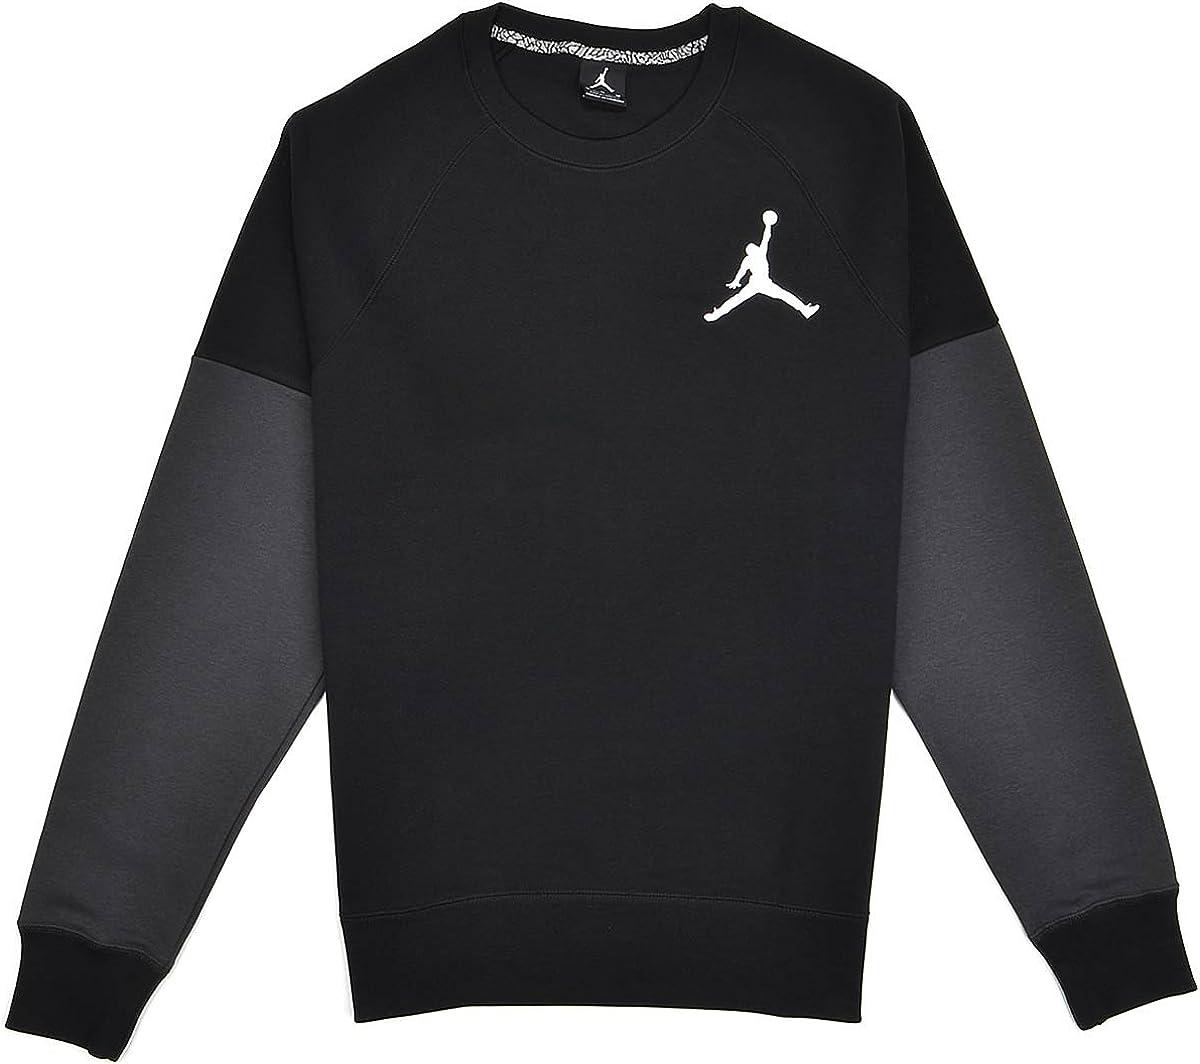 Nike Air Jordan Varsity Men's Crewneck